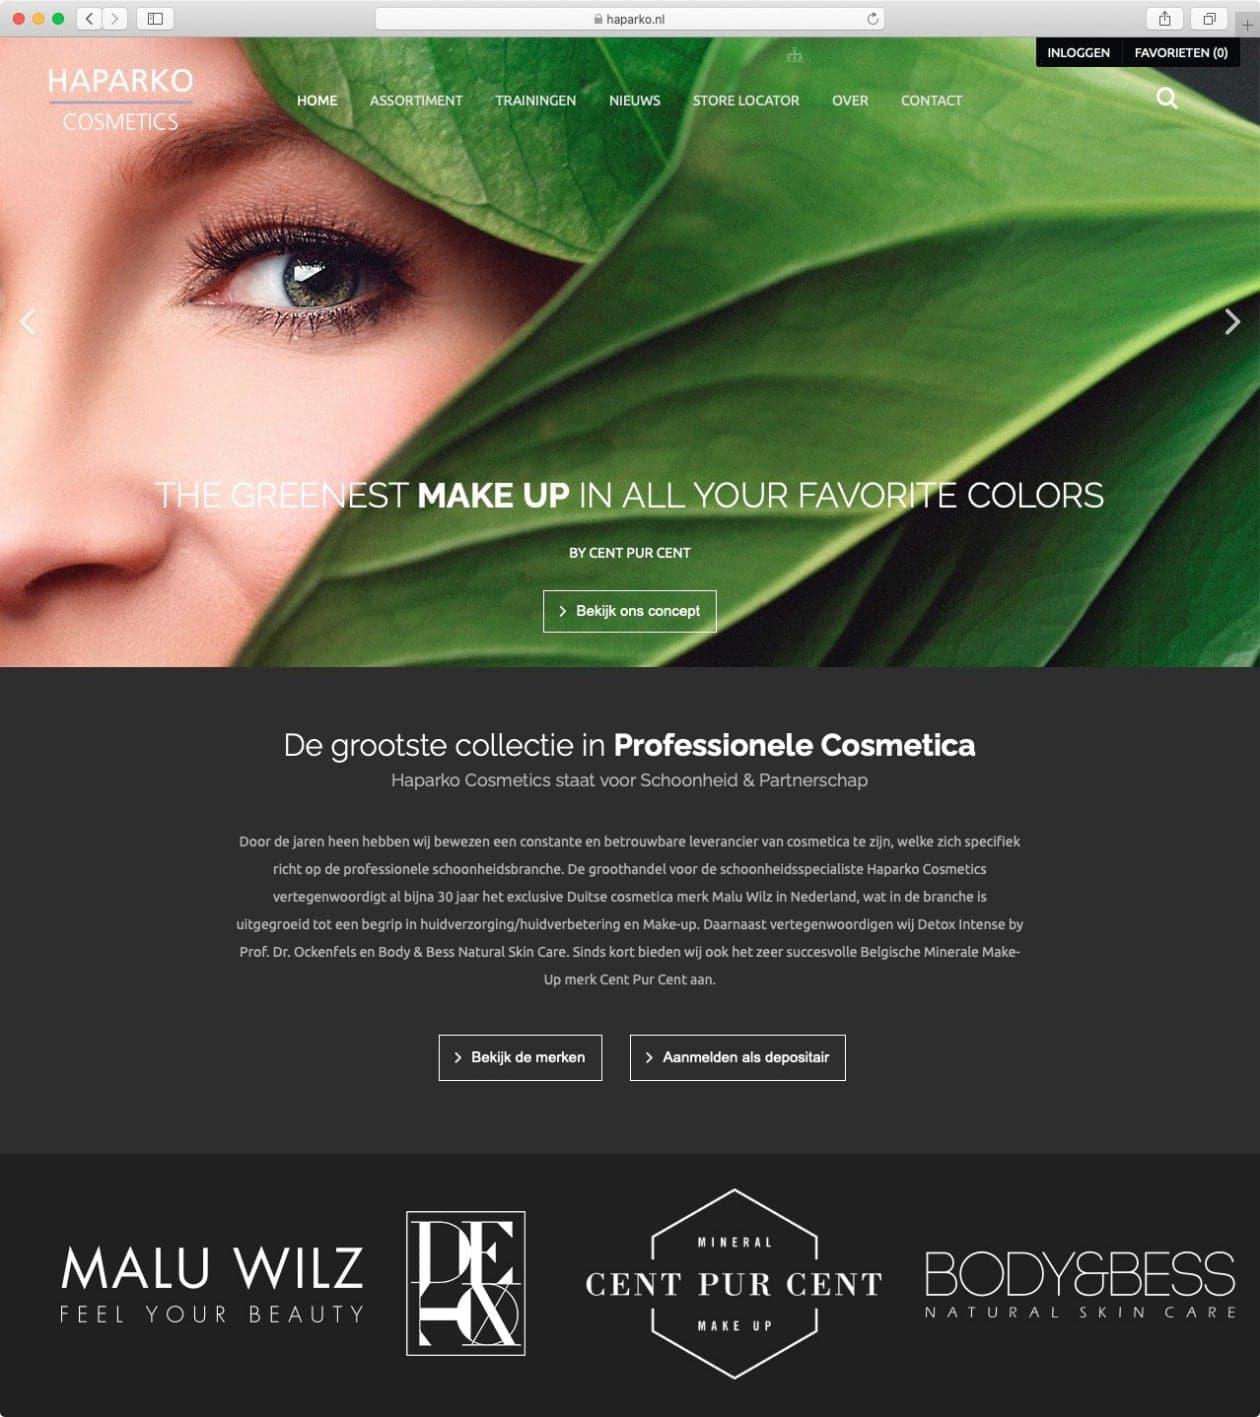 Haparko Cosmetics